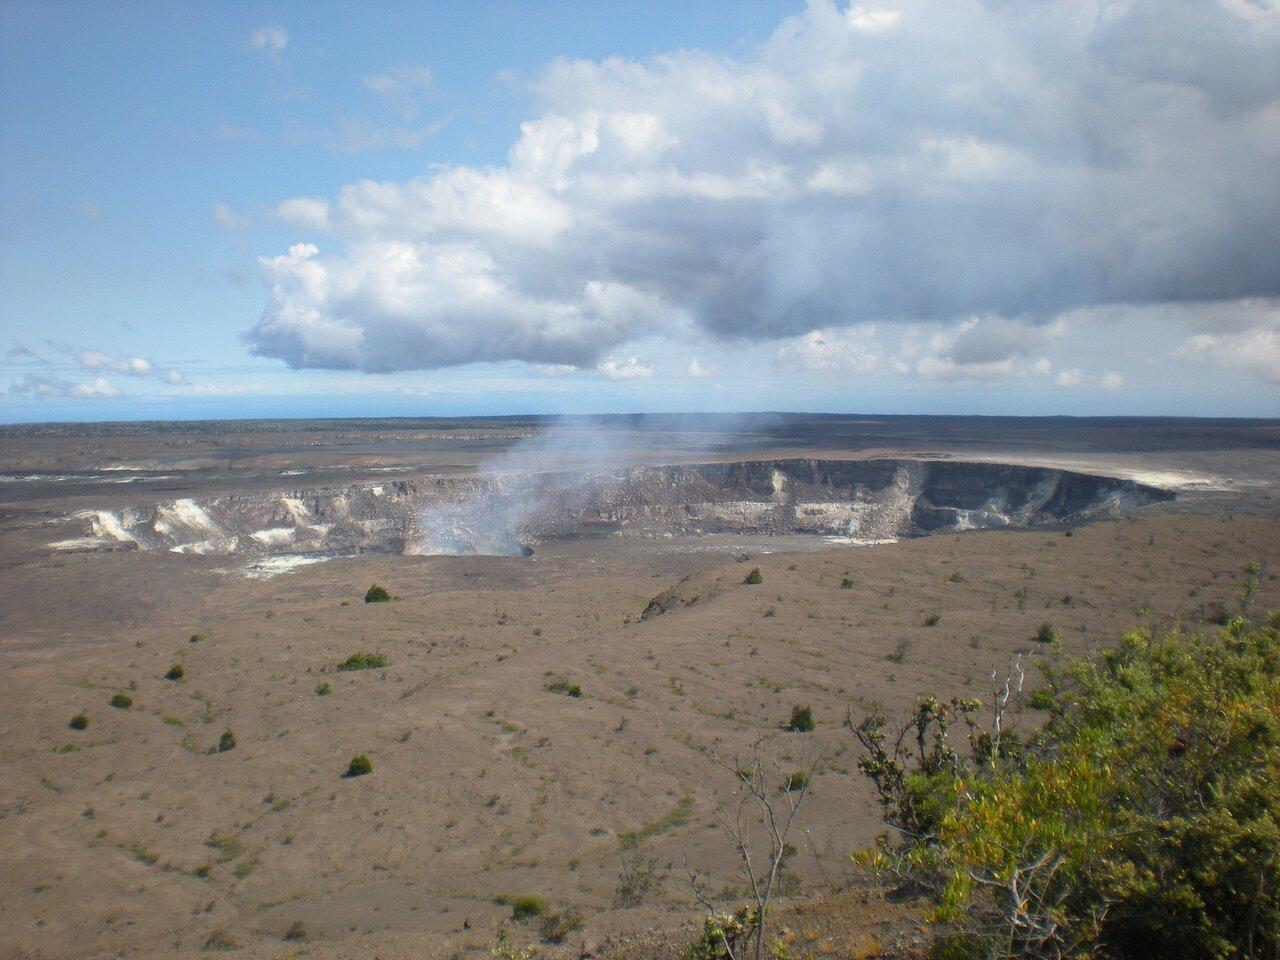 The Big Island of Hawaii: 10 Reasons to Go   TropixTraveler